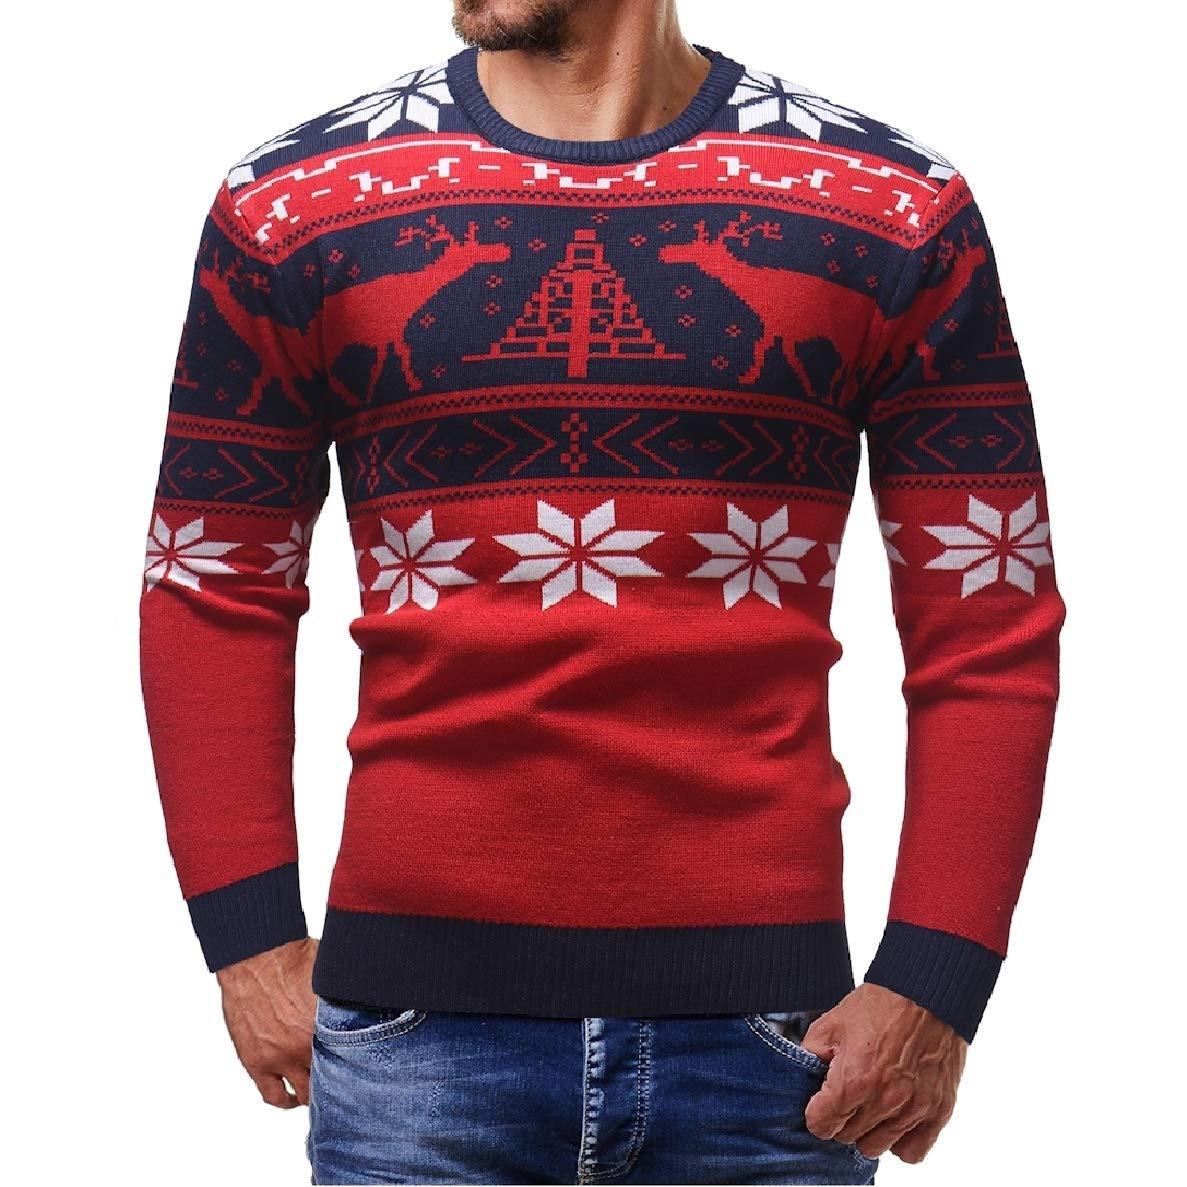 Winwinus Mens Chirstmas Comfort Long Sleeves Round Neck Casual Sweaters Tops Blouse